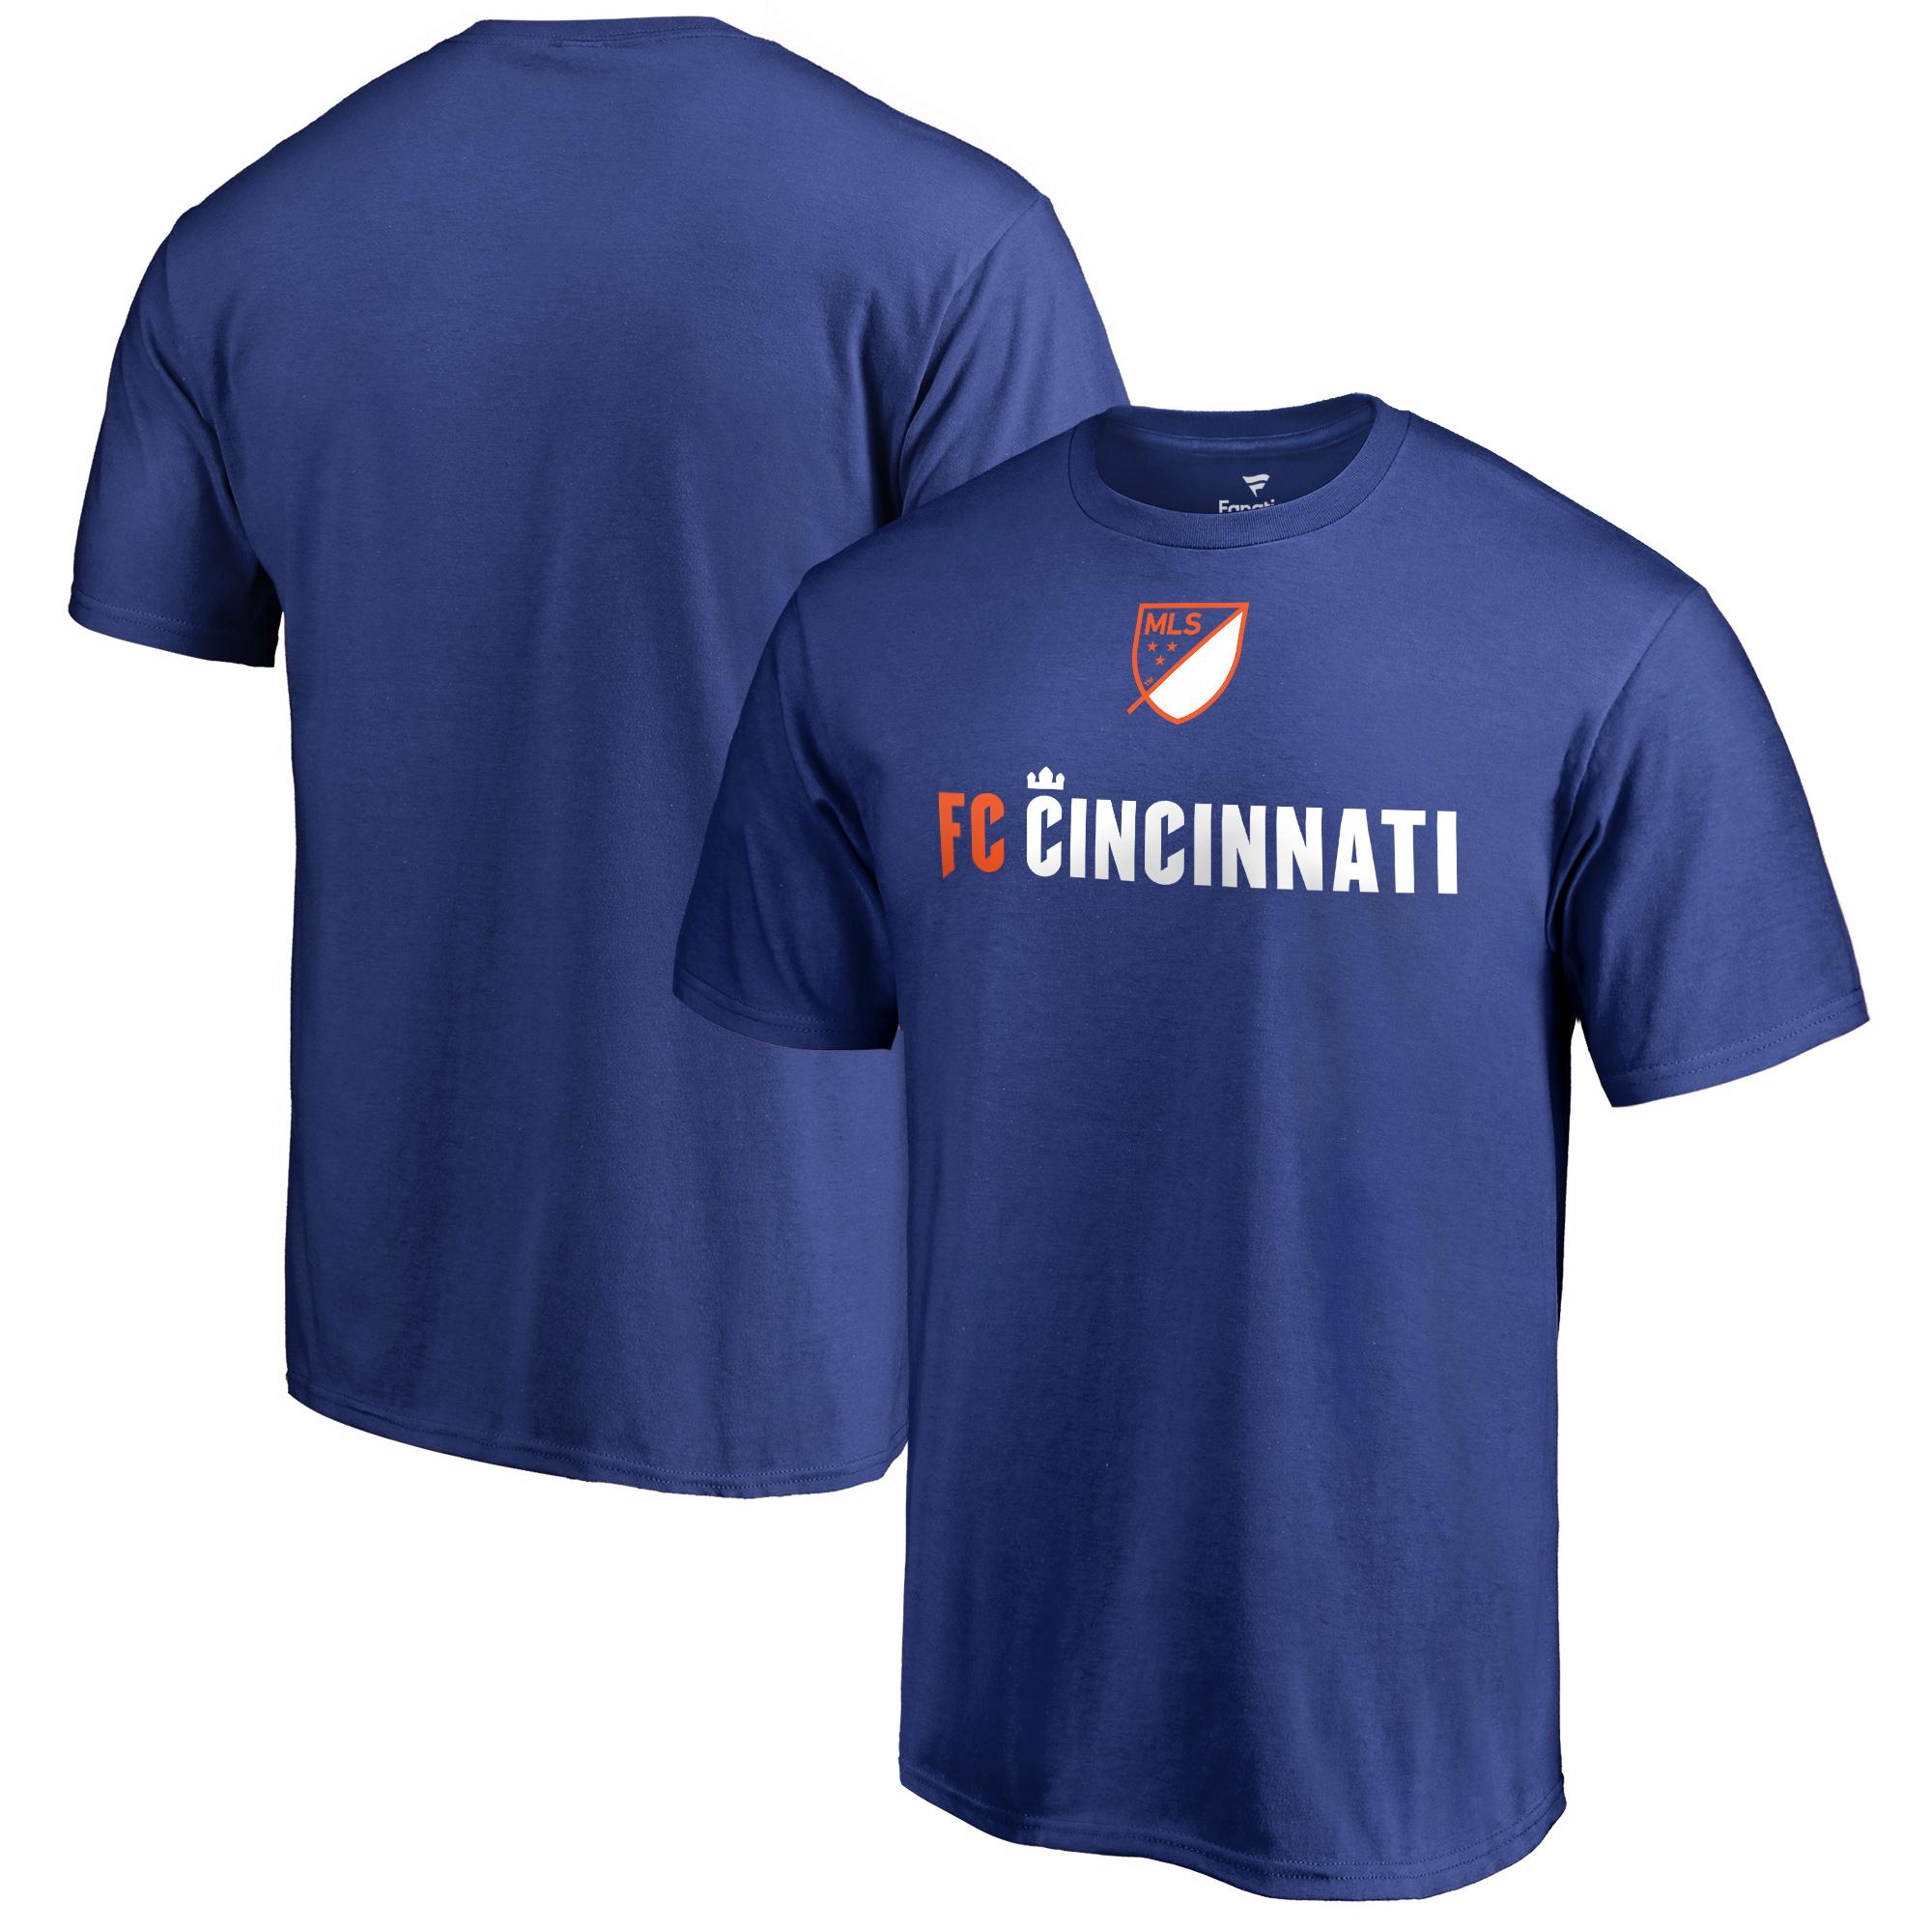 FC Cincinnati Fanatics Branded Team Shielded T-Shirt - Royal